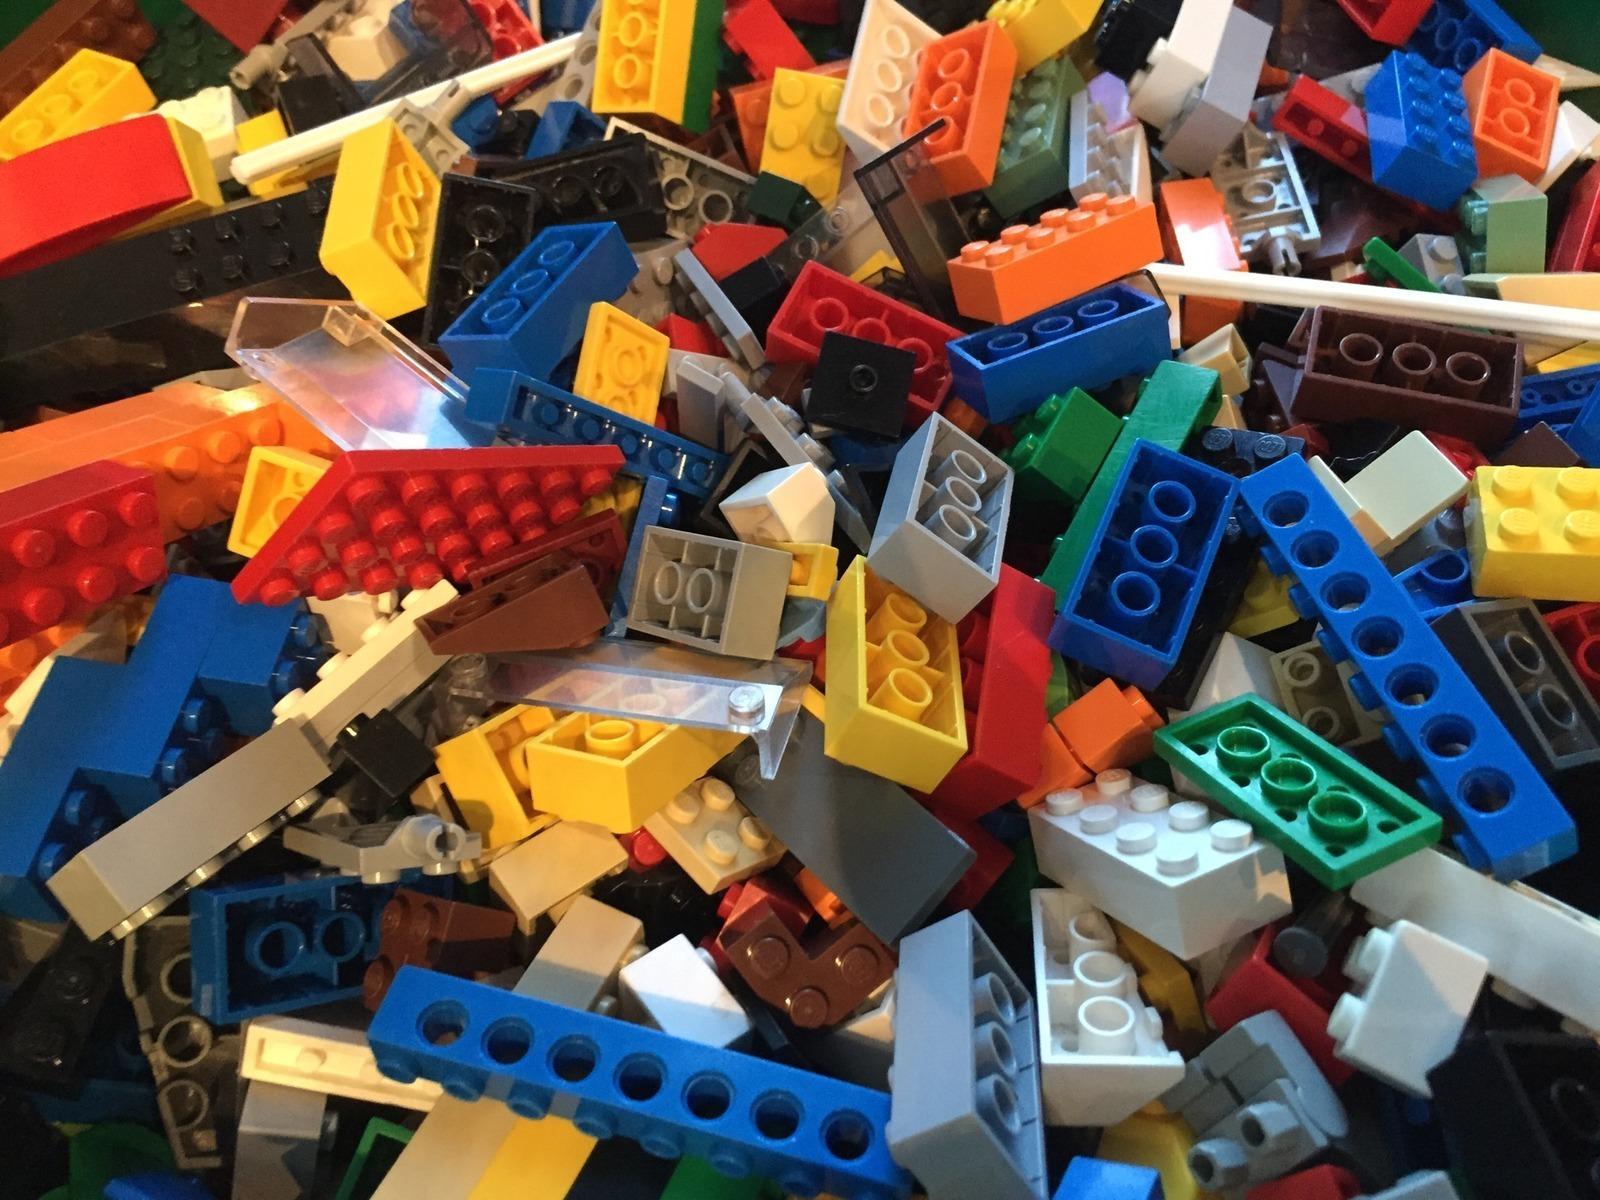 The LEGO Store - Woodfield Mall in Schaumburg, Illinois ...